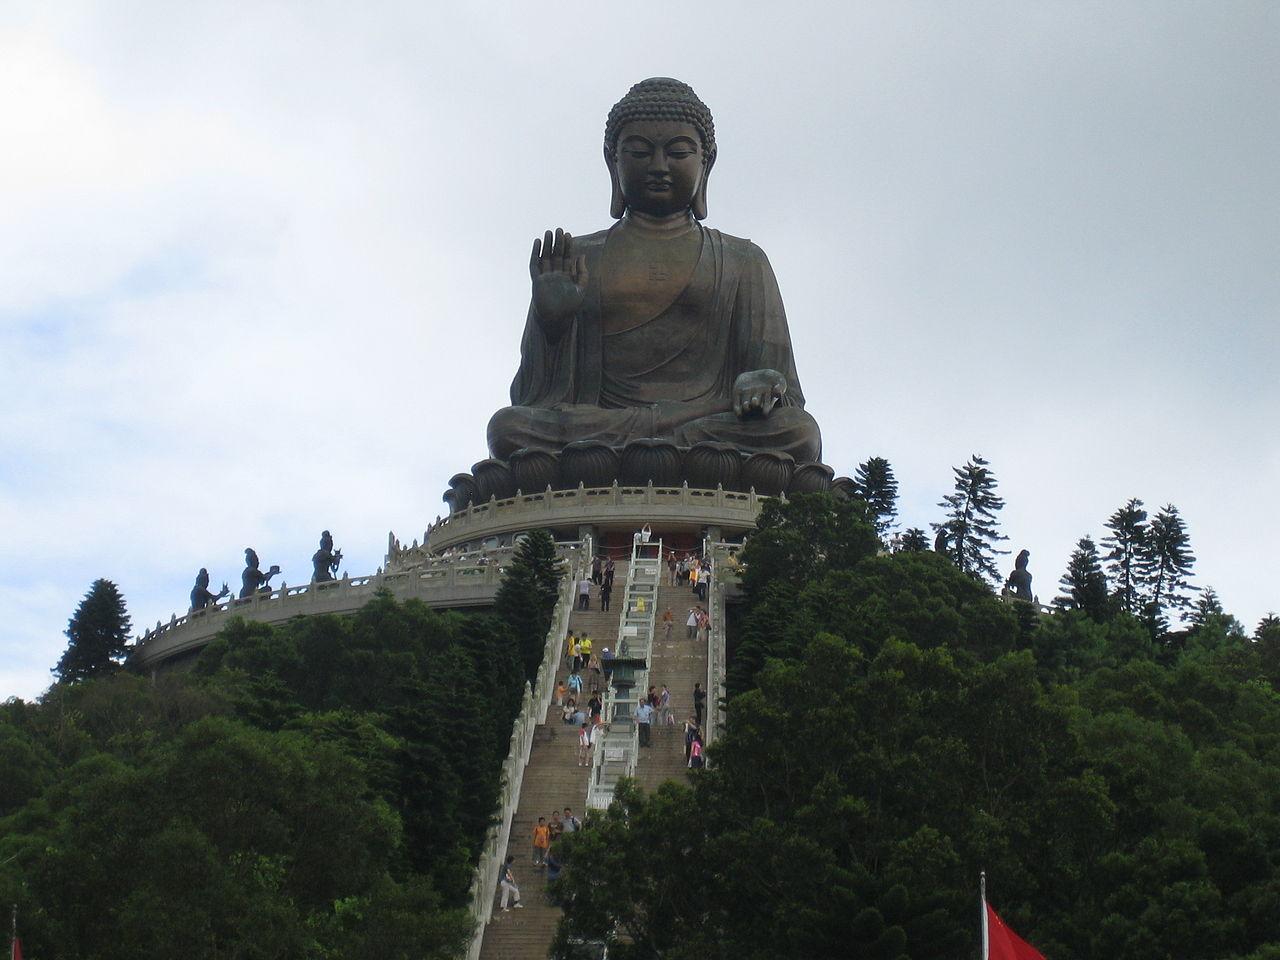 Big Buddha statue - Lantau Island, Hong Kong